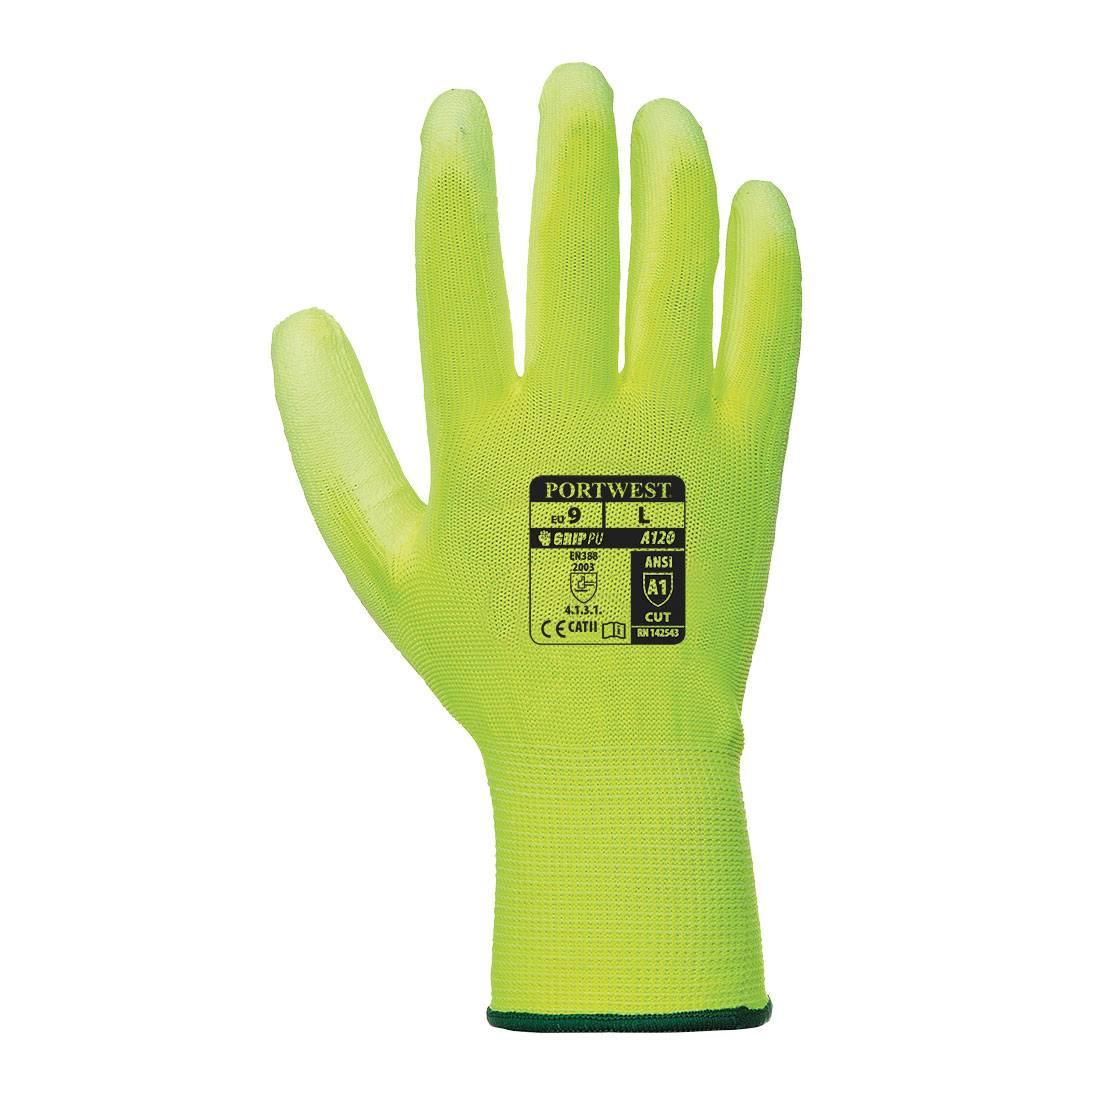 Portwest Handschoenen A120 geel-oranje(Y2)